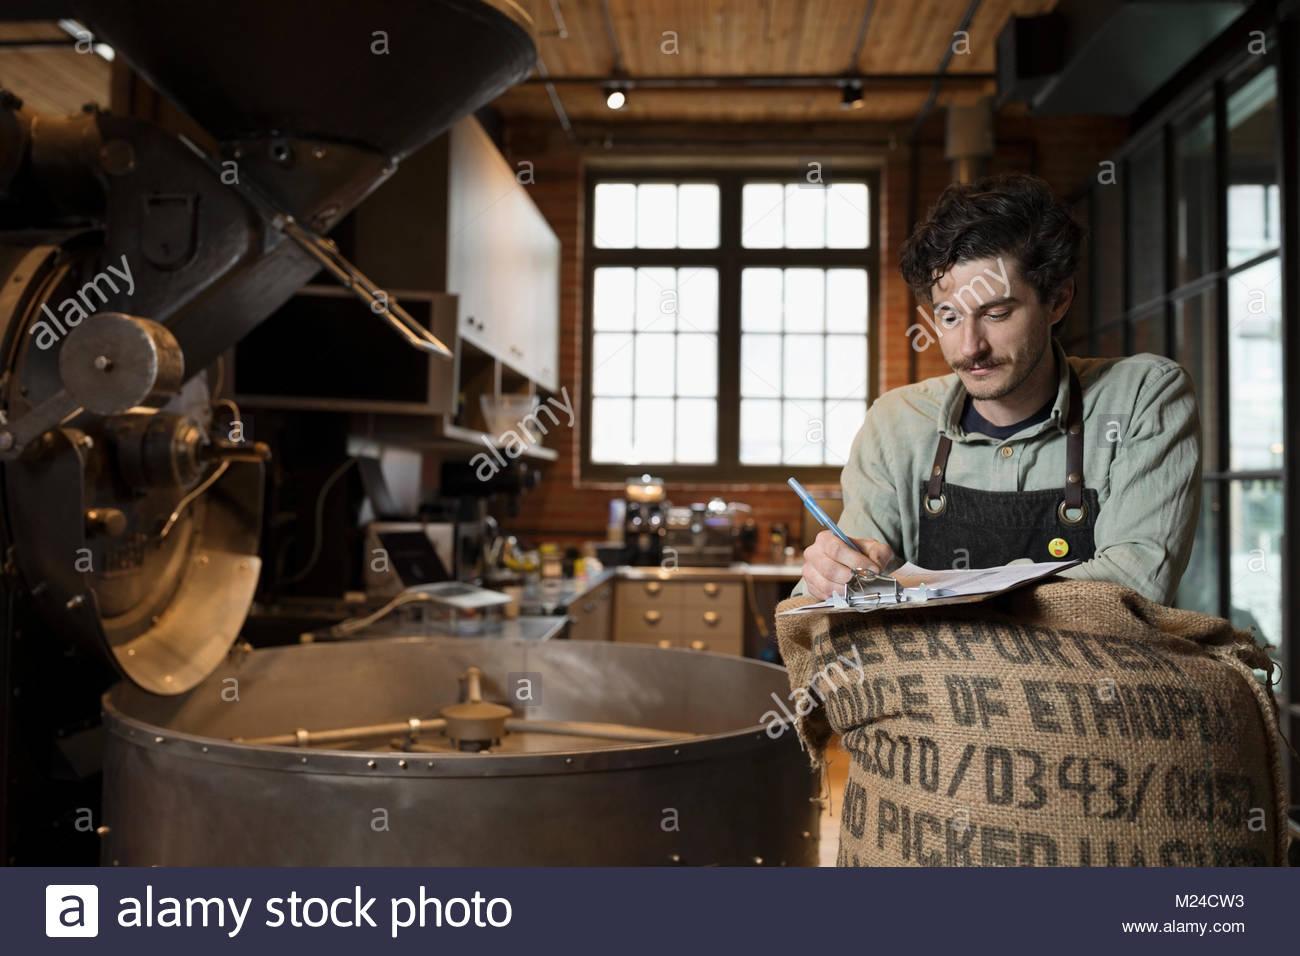 Male coffee roaster with clipboard roasting coffee - Stock Image